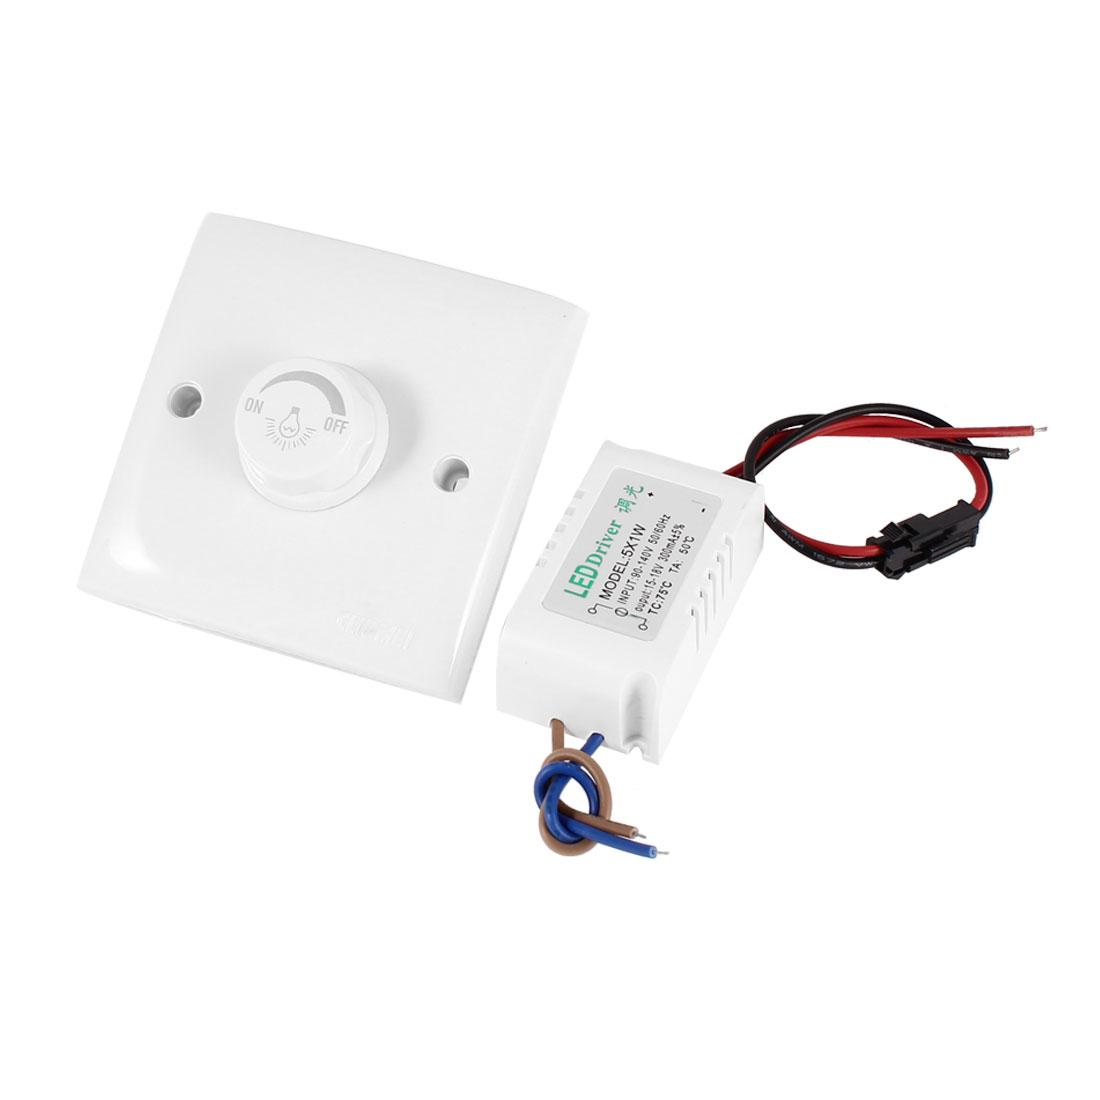 AC 200-250V White Wall Panle Plate LED Lamp Light Dimmer Control Switch w 15V-18V 300mA LED Driver